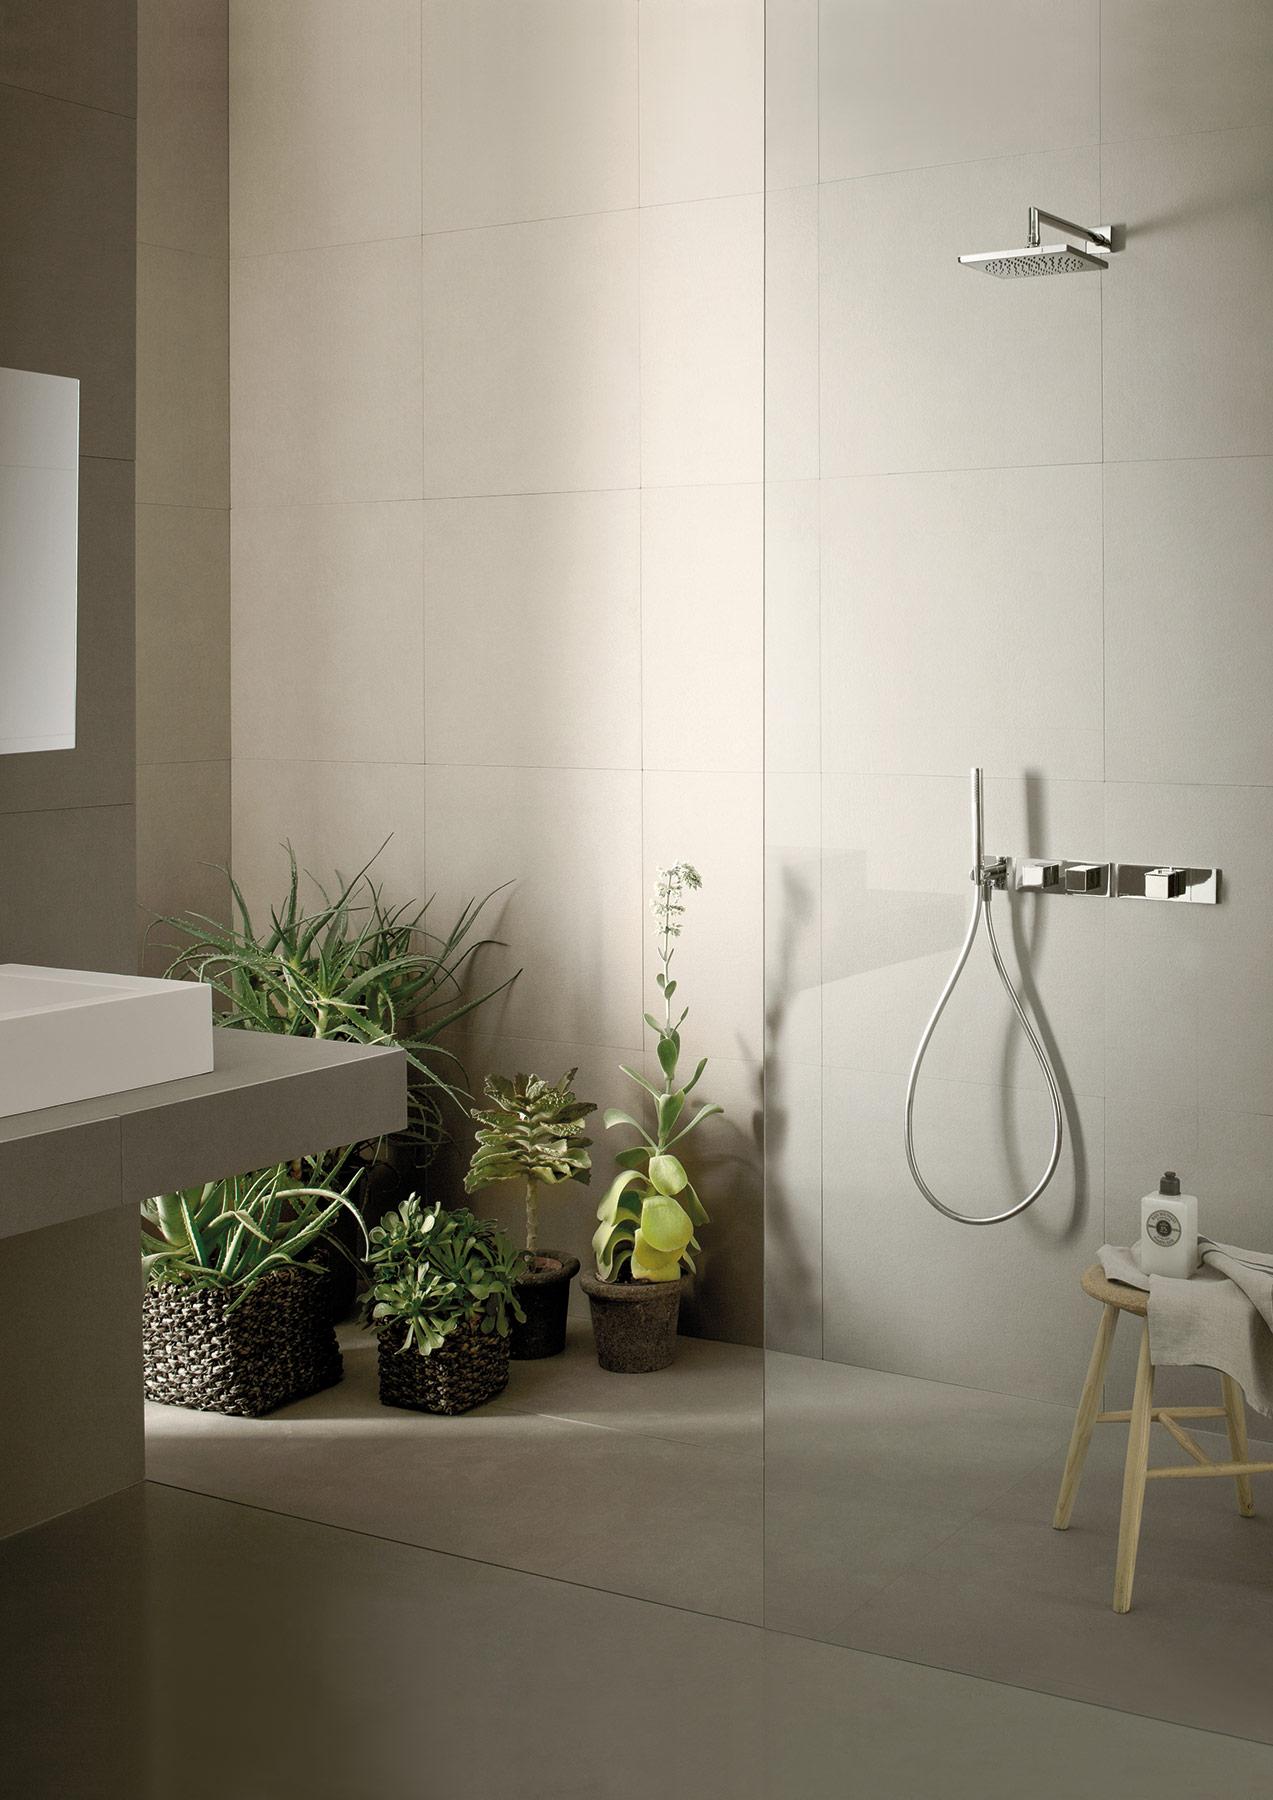 Contemporary Mint Wall Mount Shower Set